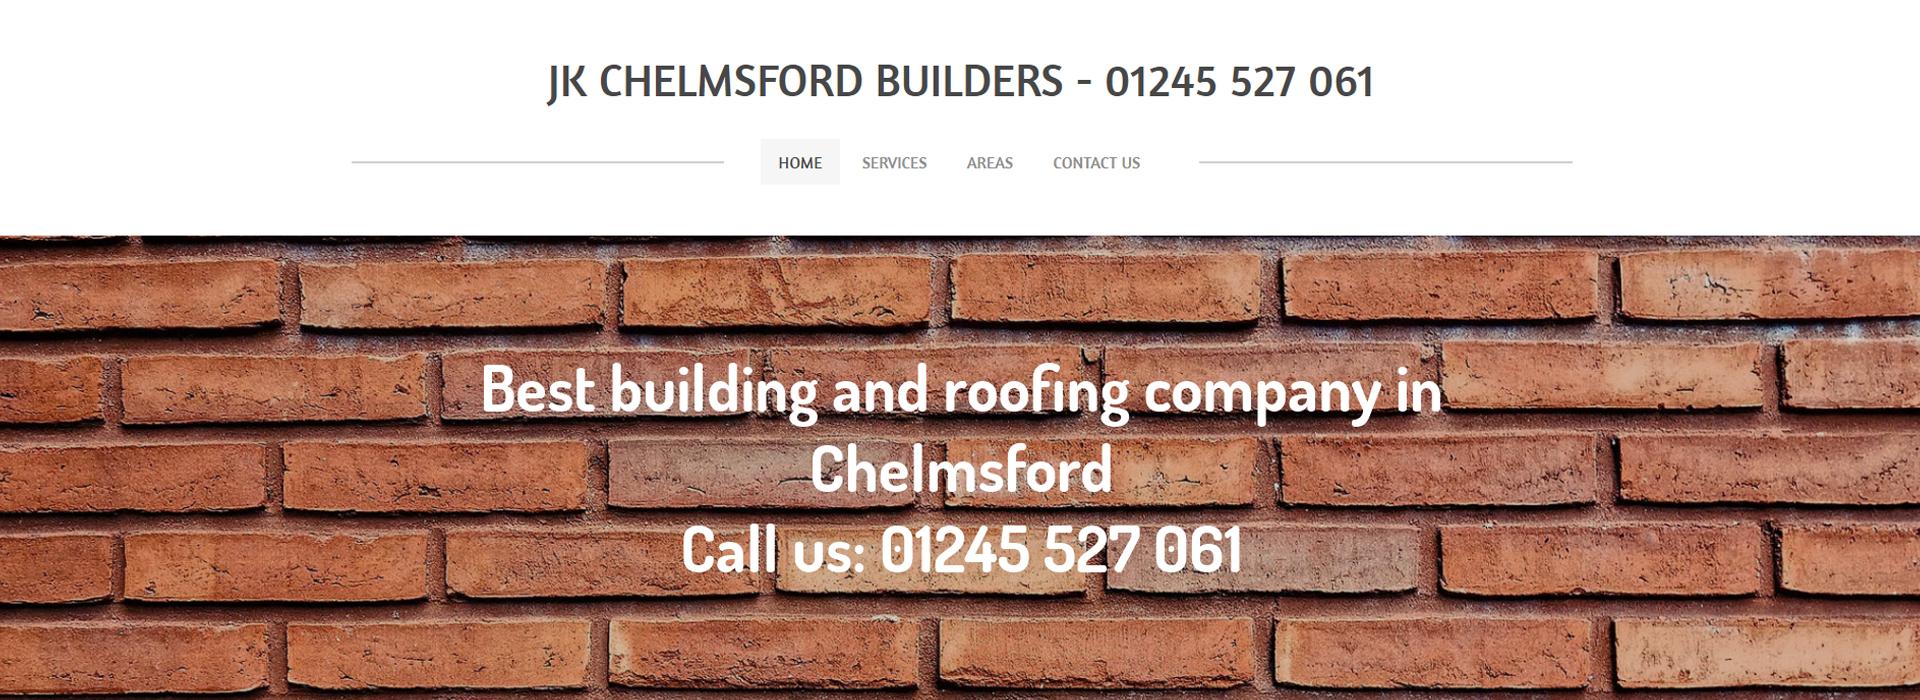 JK Chelmsford builders